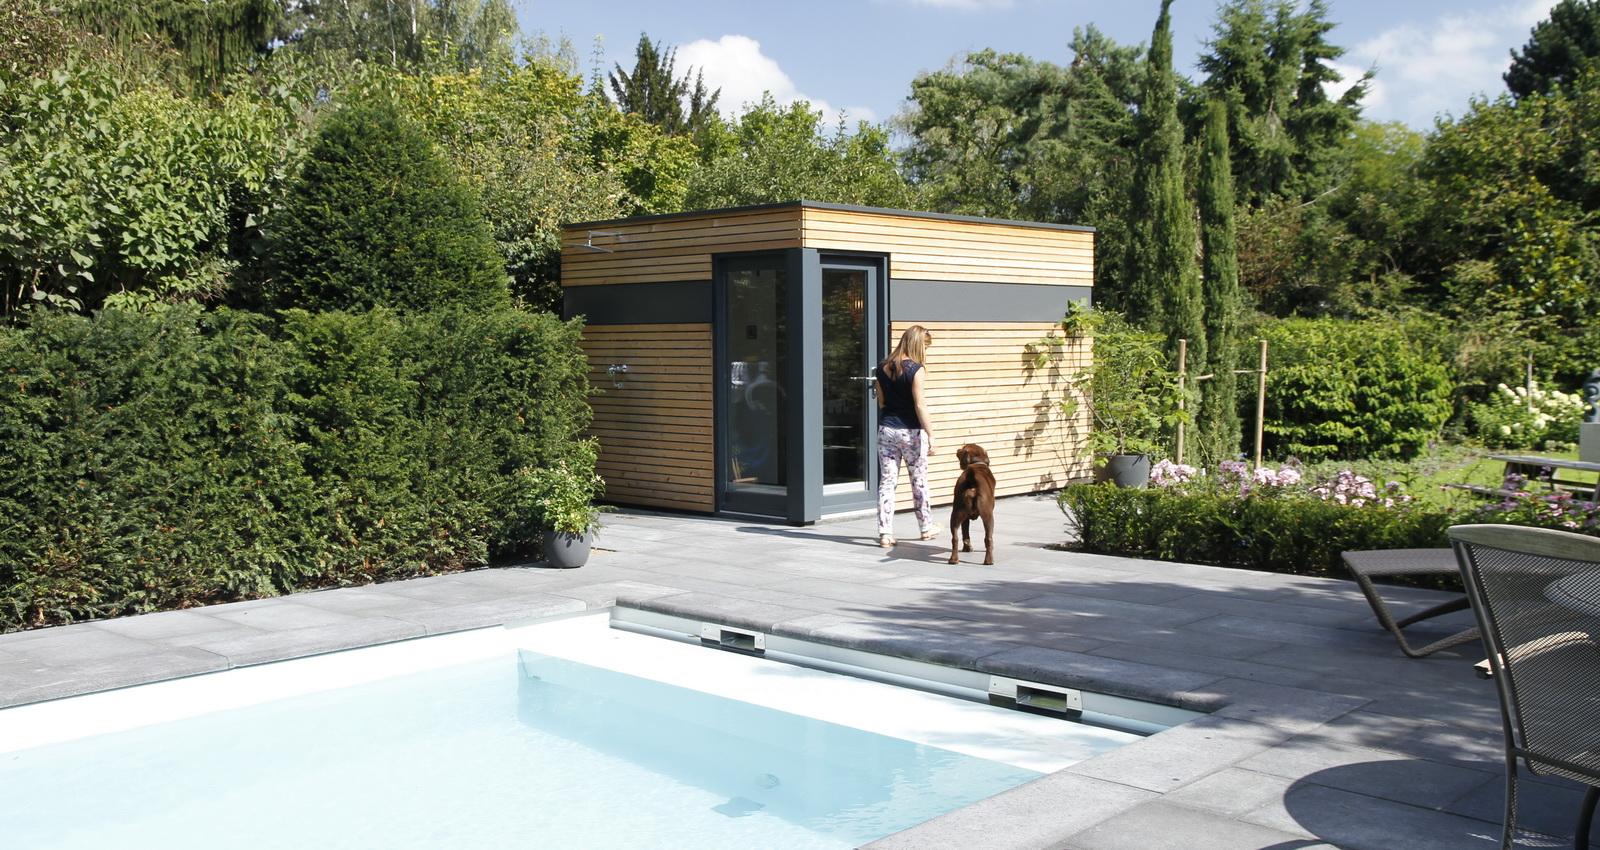 Design Gartenhaus moderne Gartenhäuser schicke Gartensauna auch ...